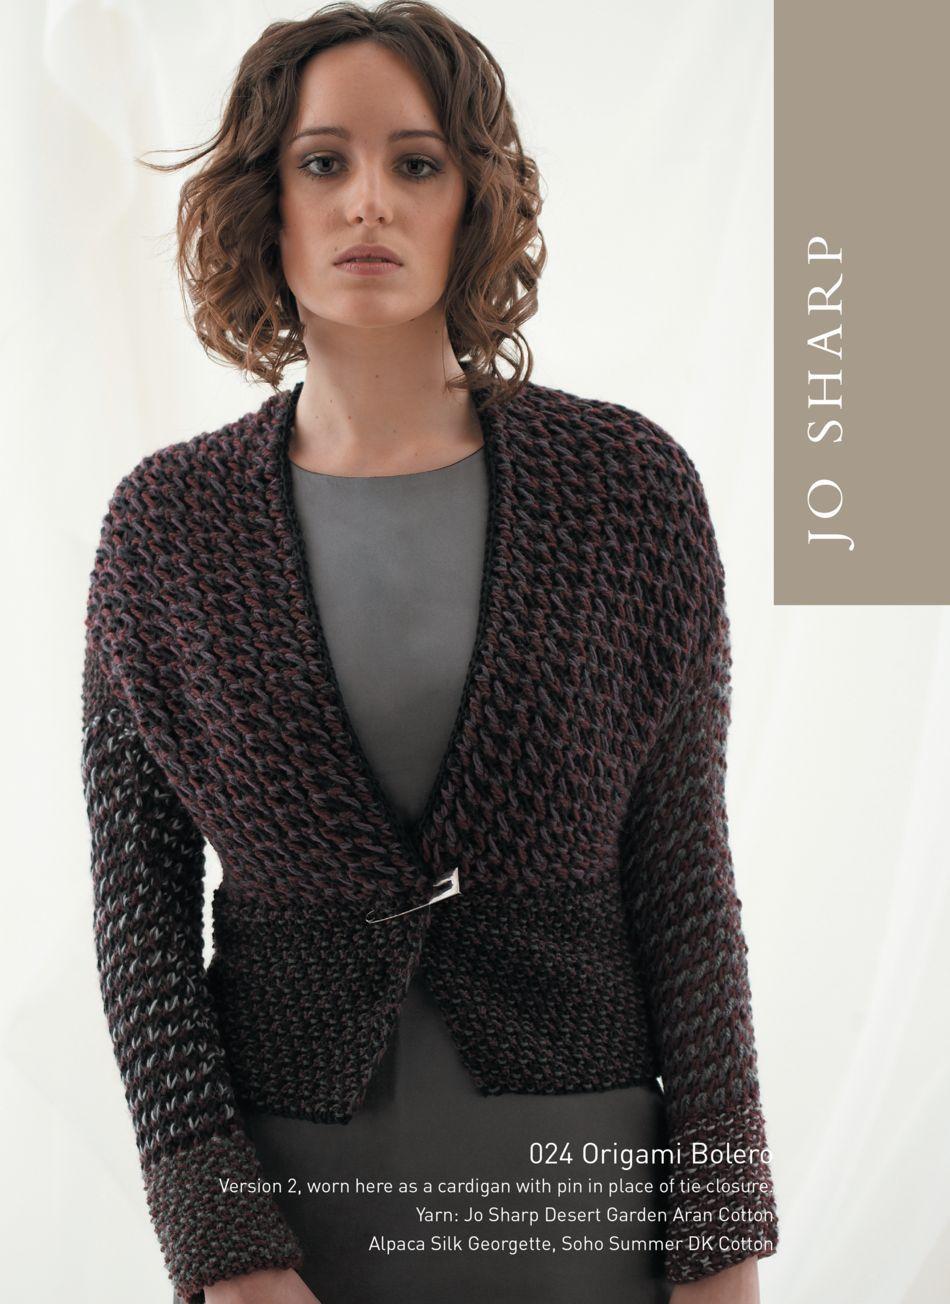 Jo Sharp Origami Bolero Pattern, Knitting Pattern - Halcyon Yarn